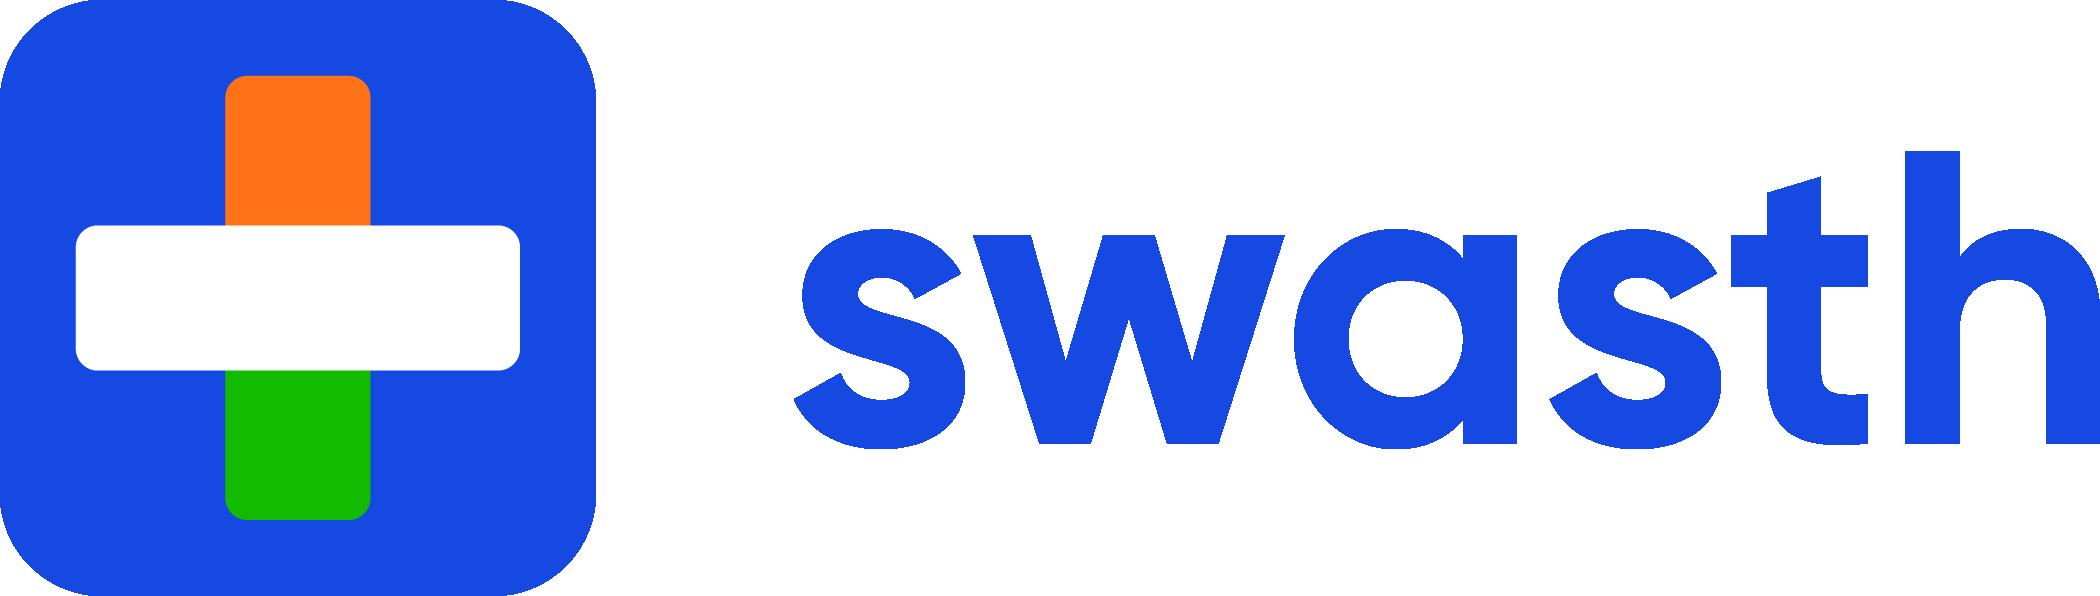 Swasth app